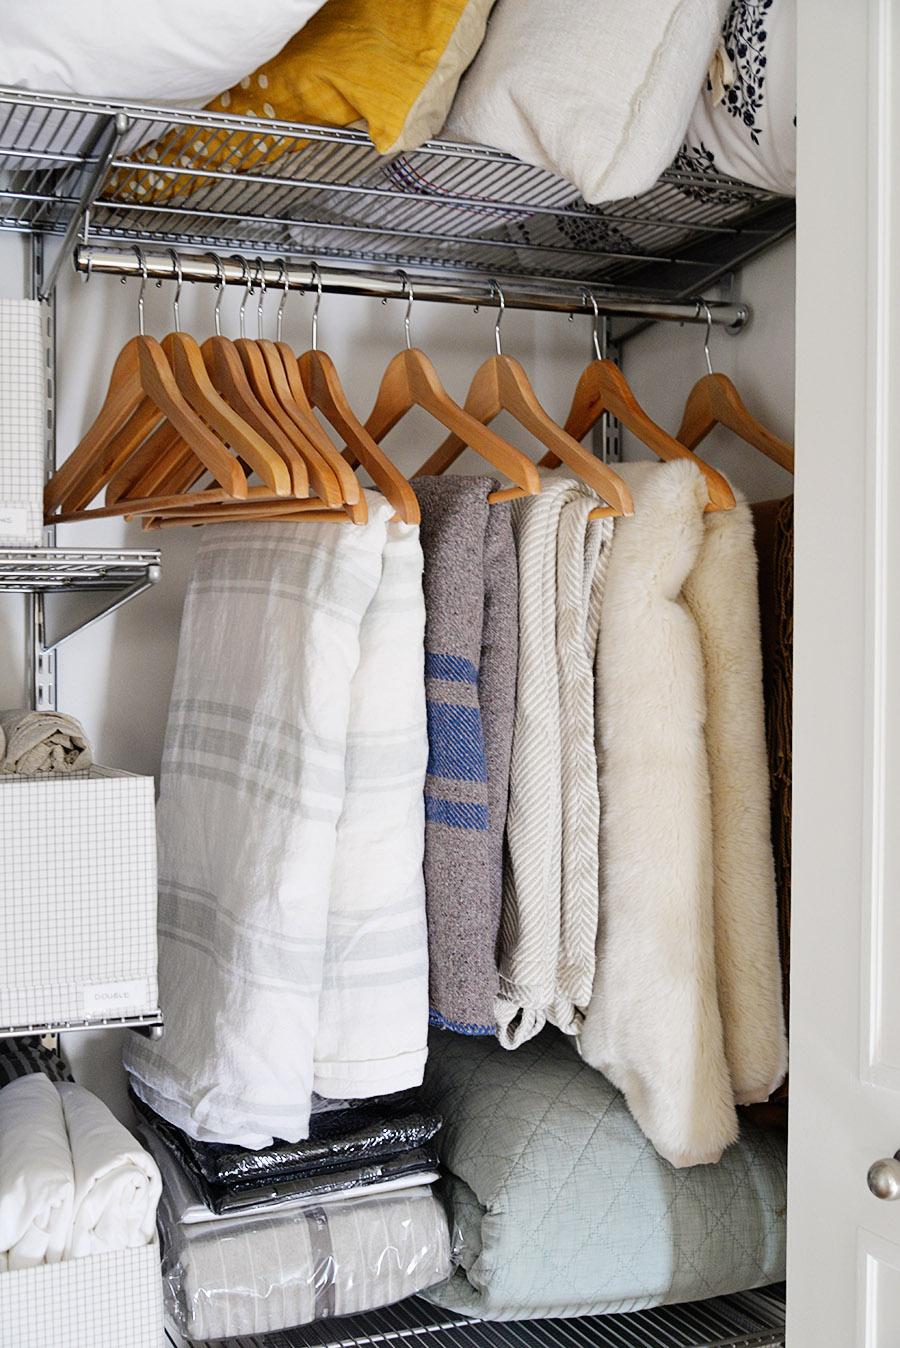 linen closet organization ideas, ideas for linen closet, how to store blankets, blankets on hangers